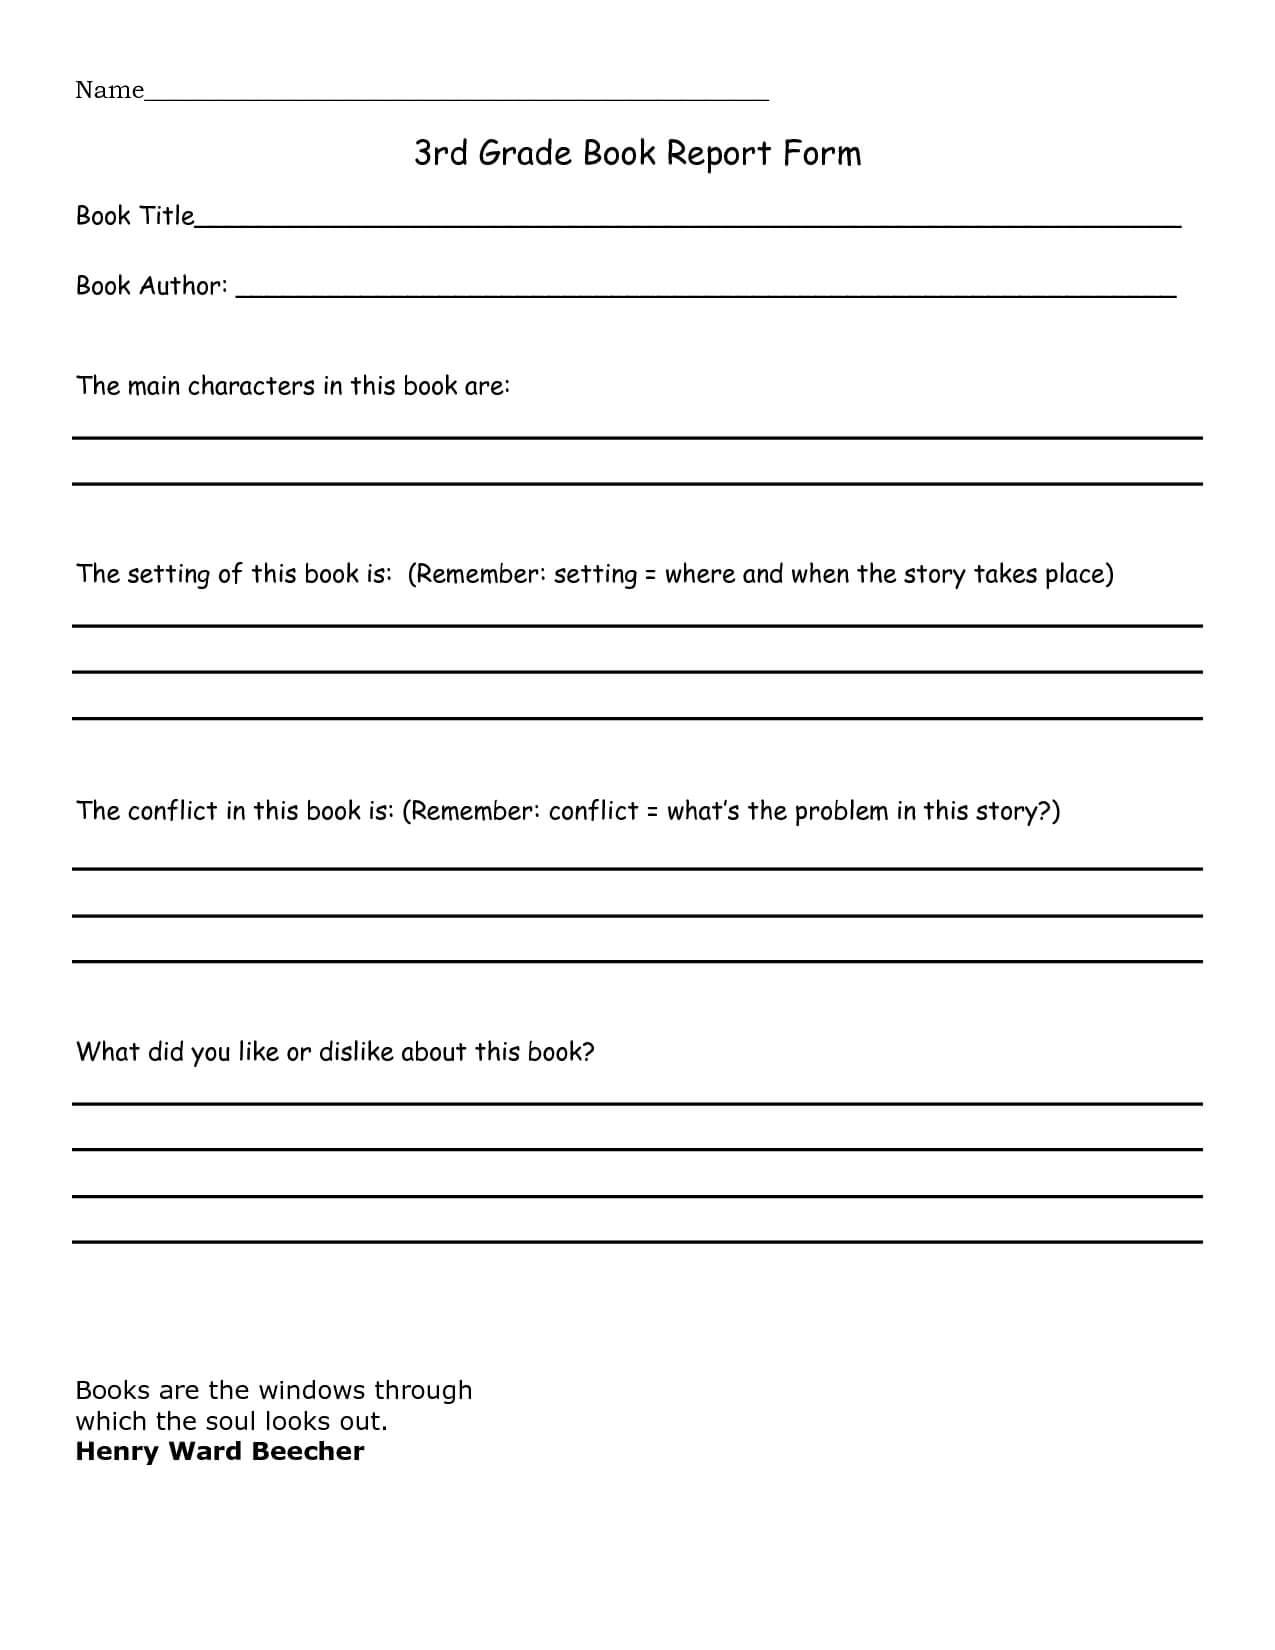 Book Report 3Rd Grade Template - Google Search | Book Report Intended For Book Report Template 3Rd Grade